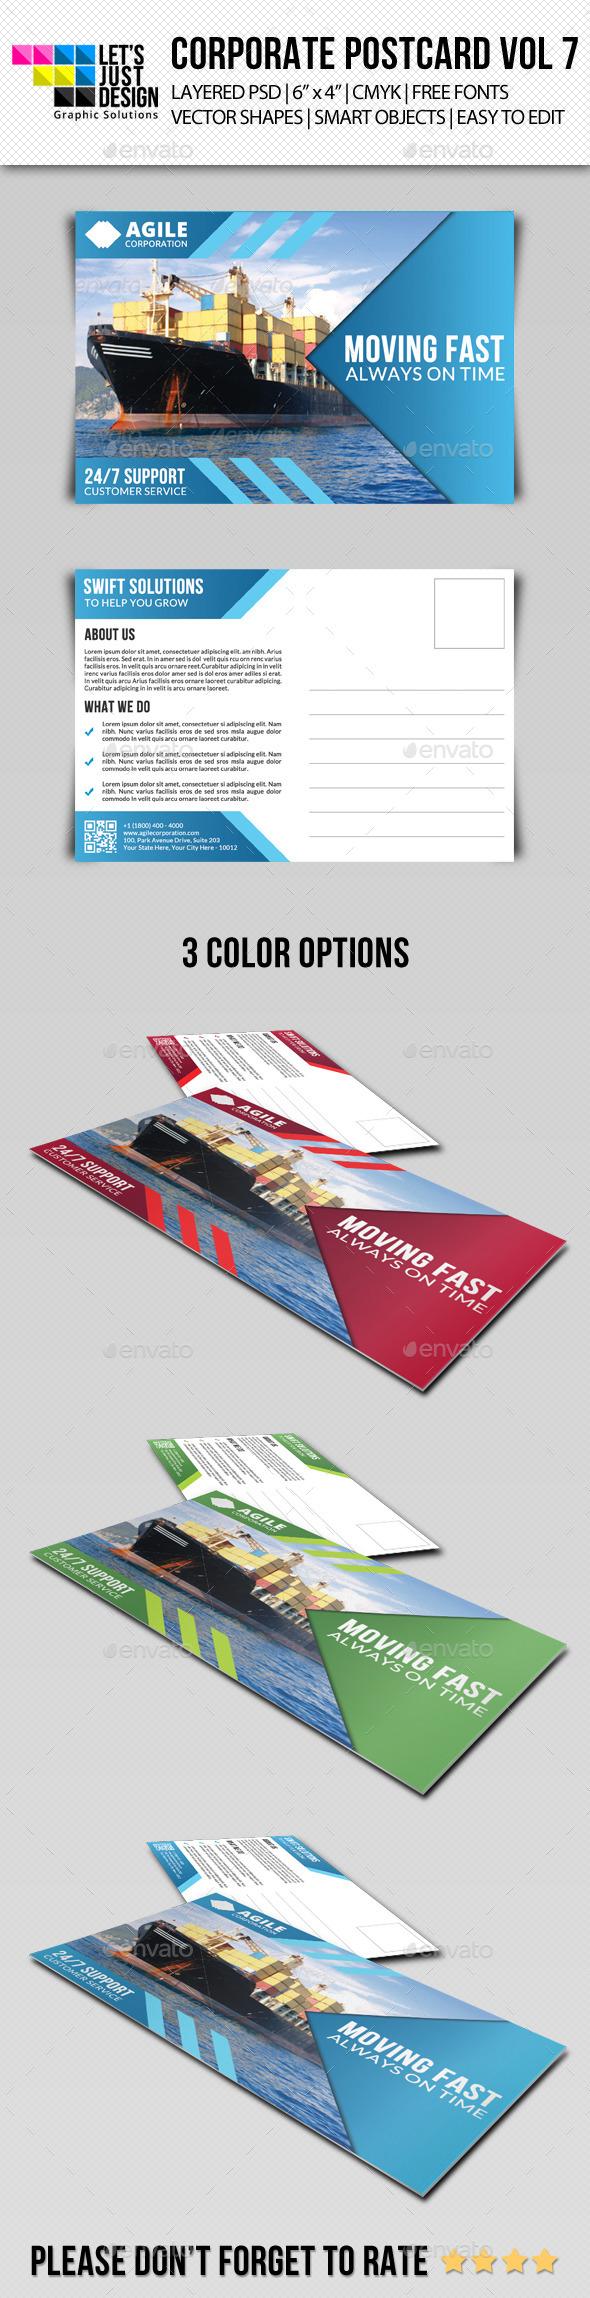 Corporate Postcard Template Vol 7 - Cards & Invites Print Templates